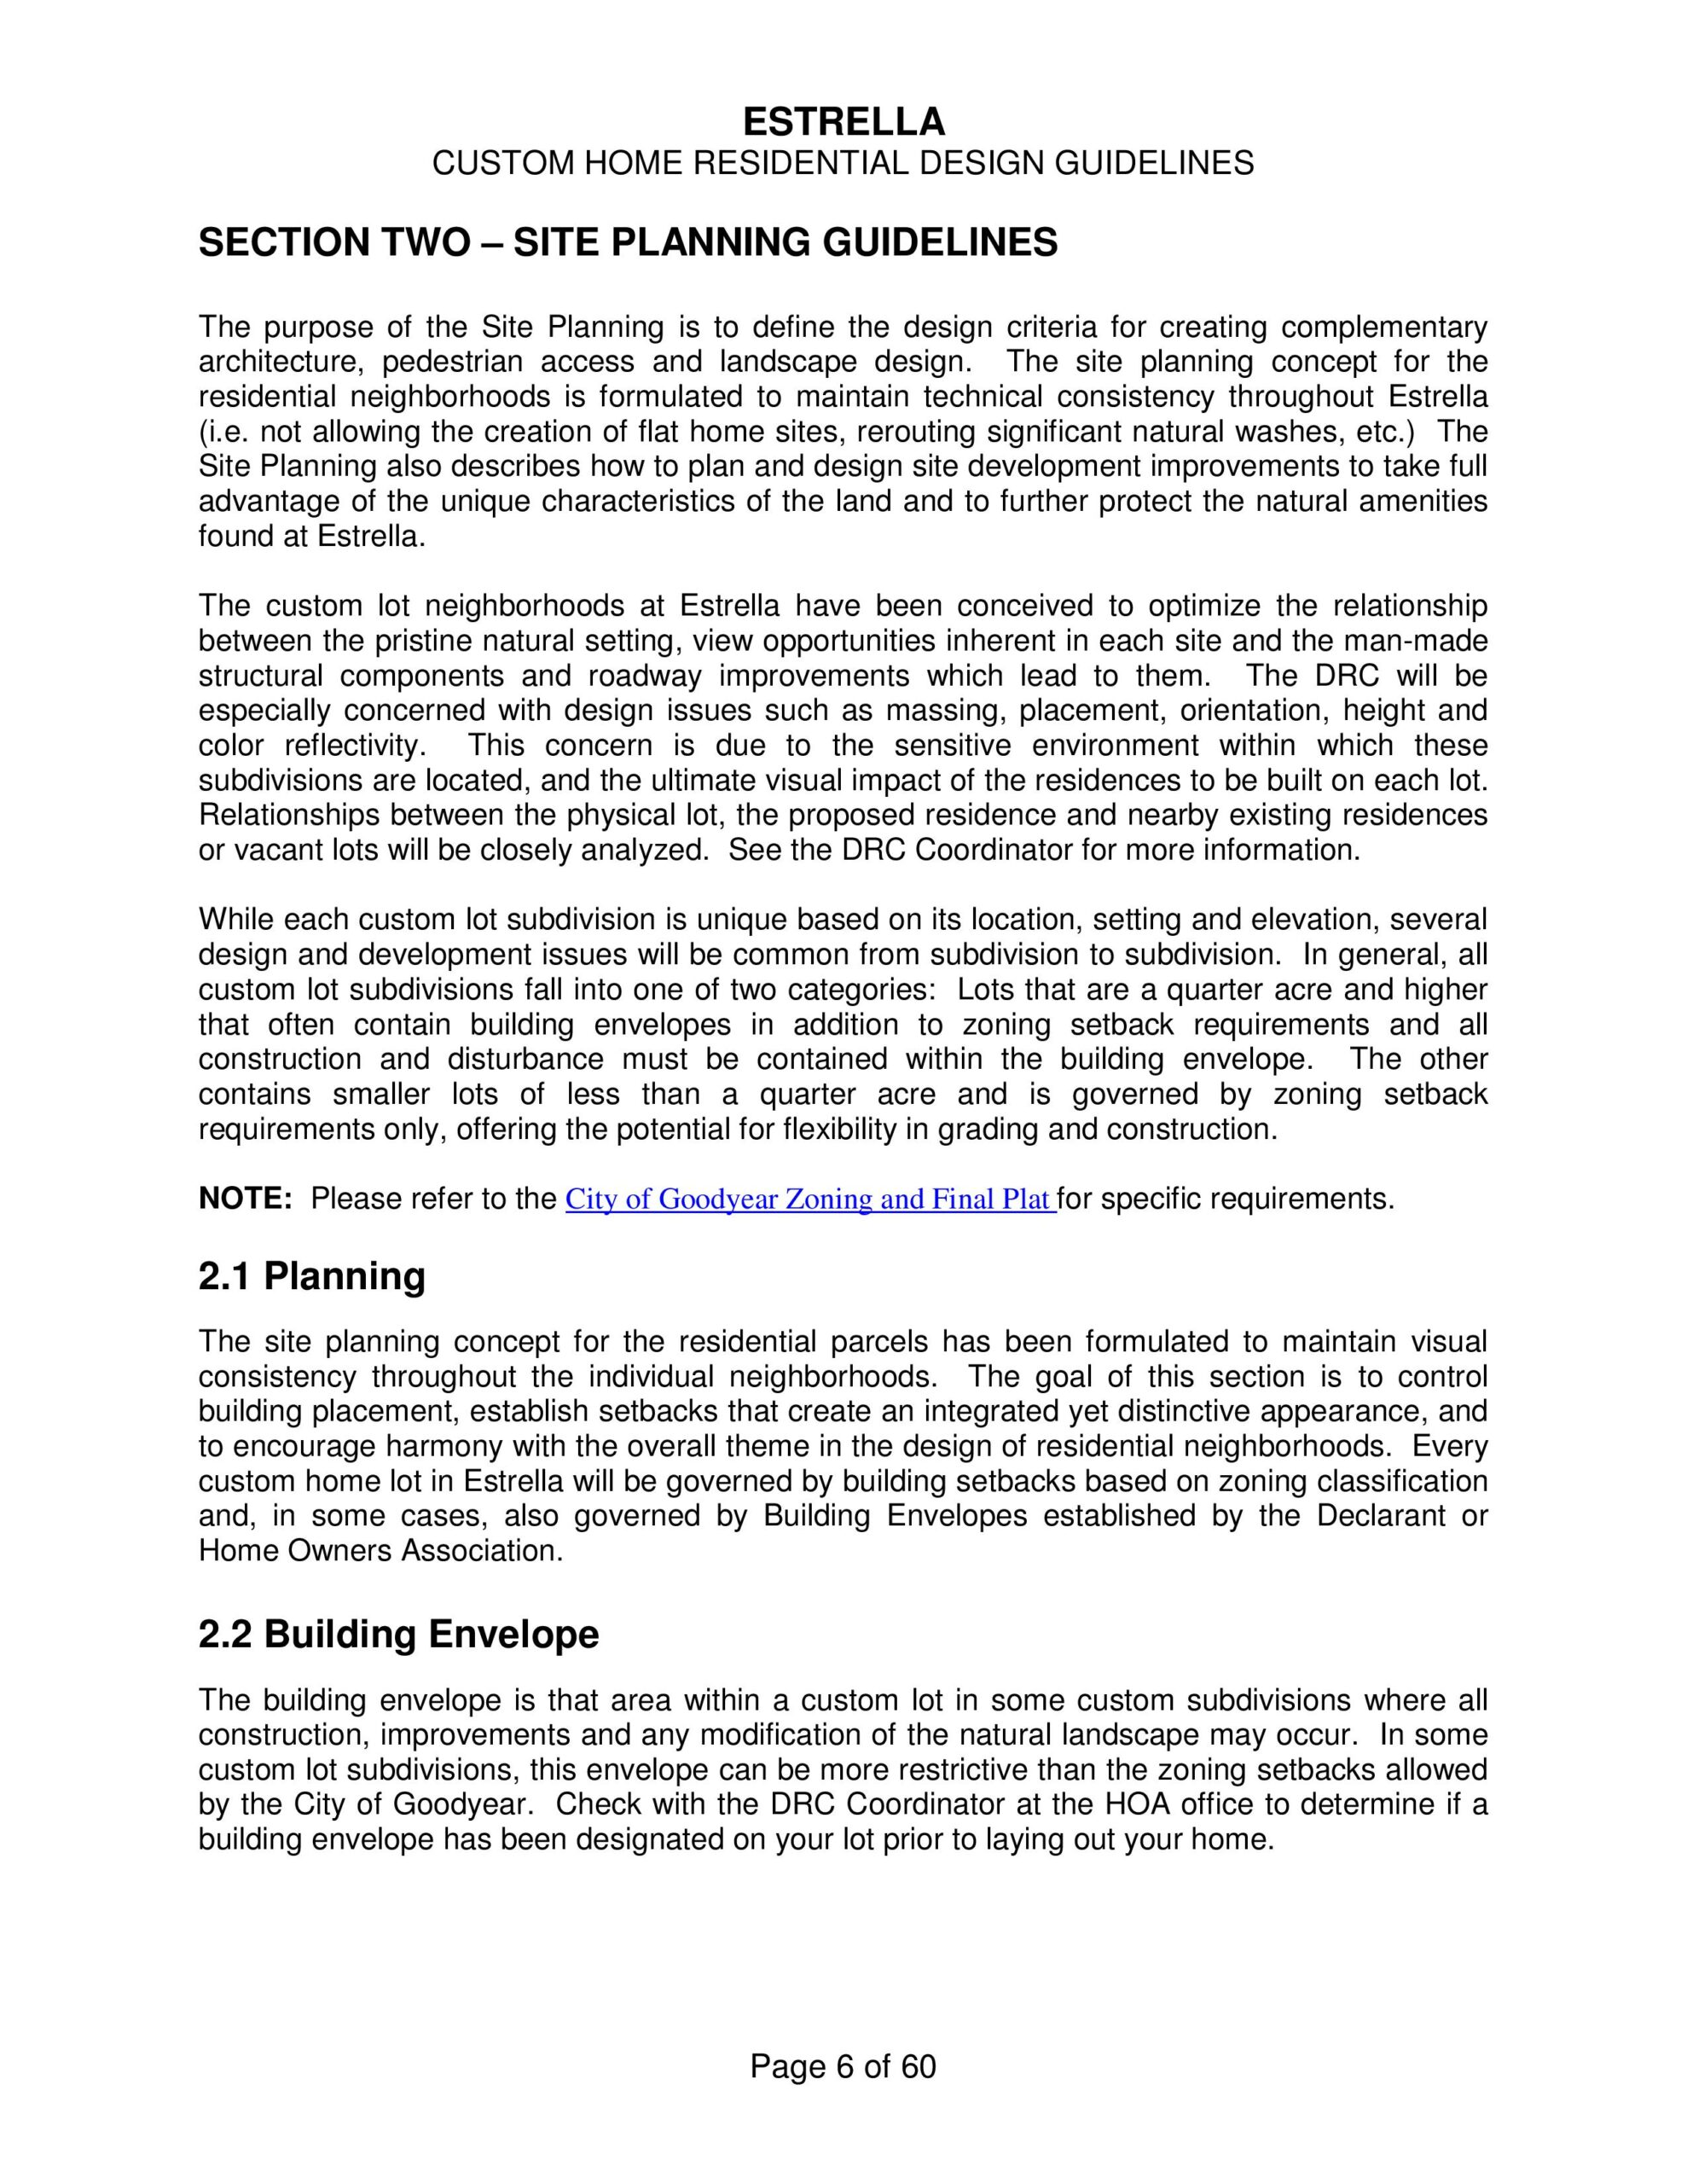 ESTRELLA MOUNTAIN CUSTOM HOME GUIDELINES-page-010